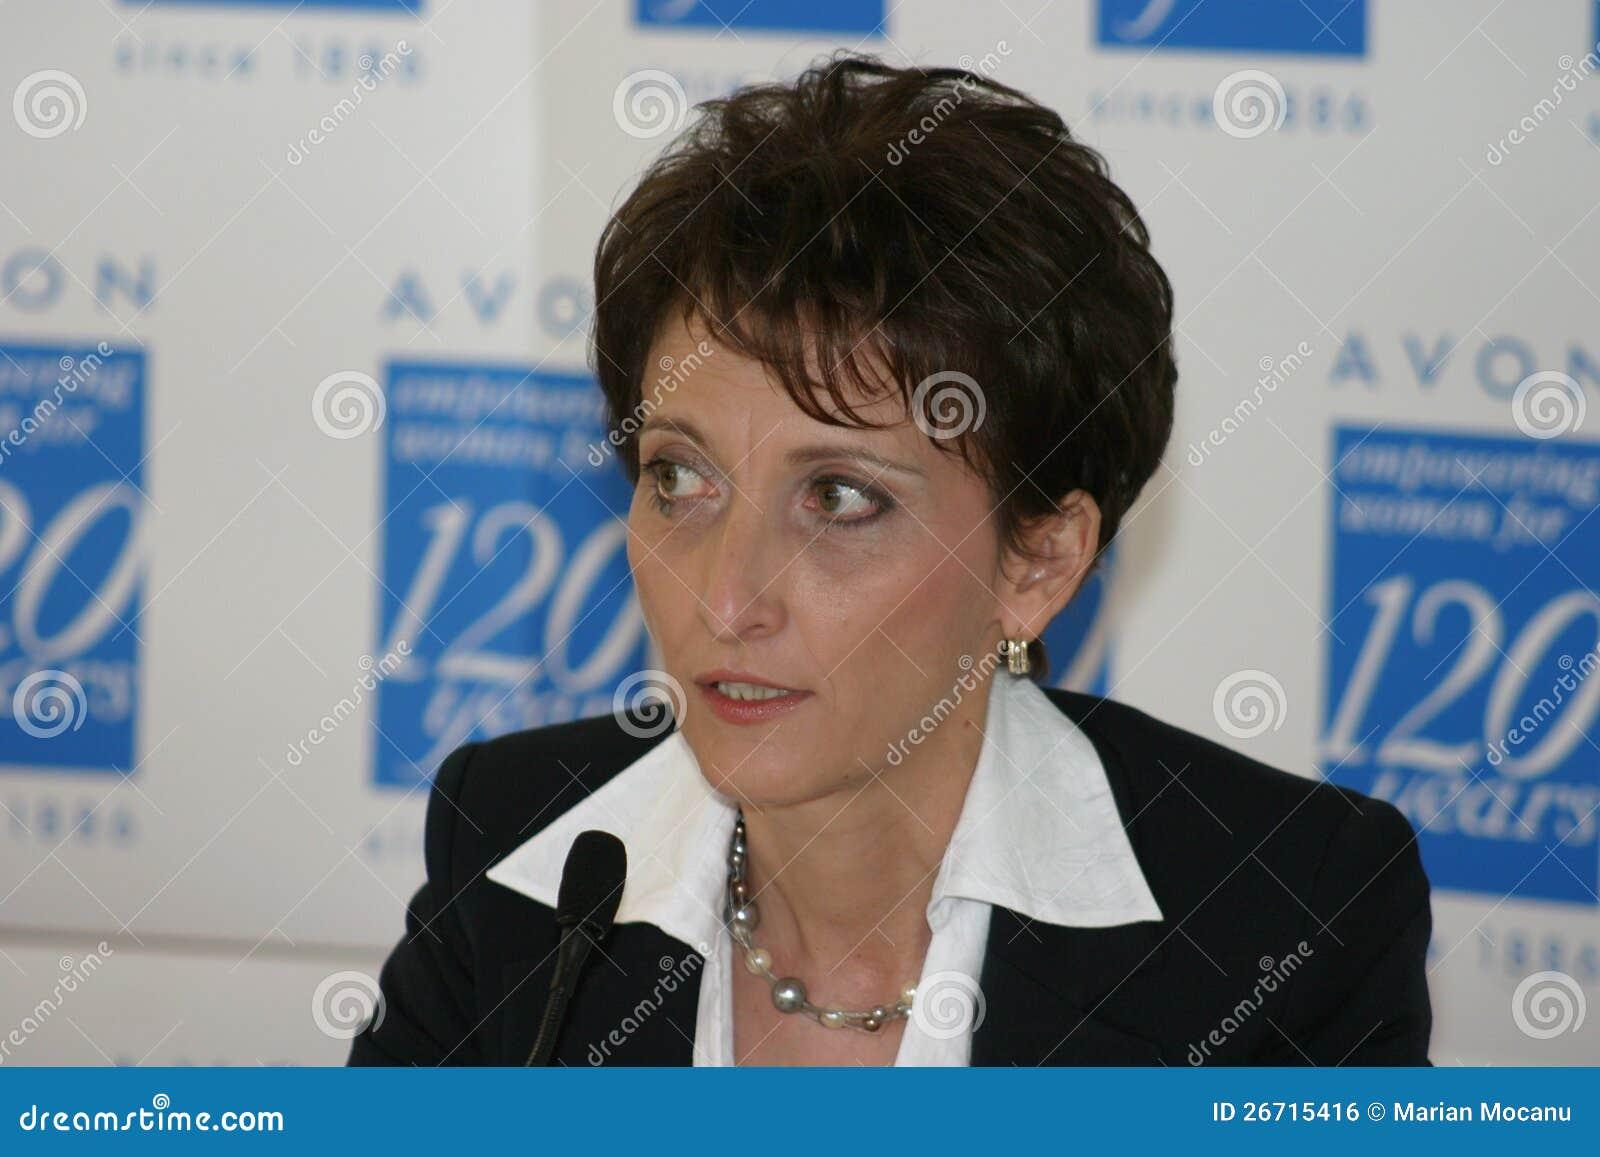 Carmen Vasilescu Fotografia Editoriale - carmen-vasilescu-26715416